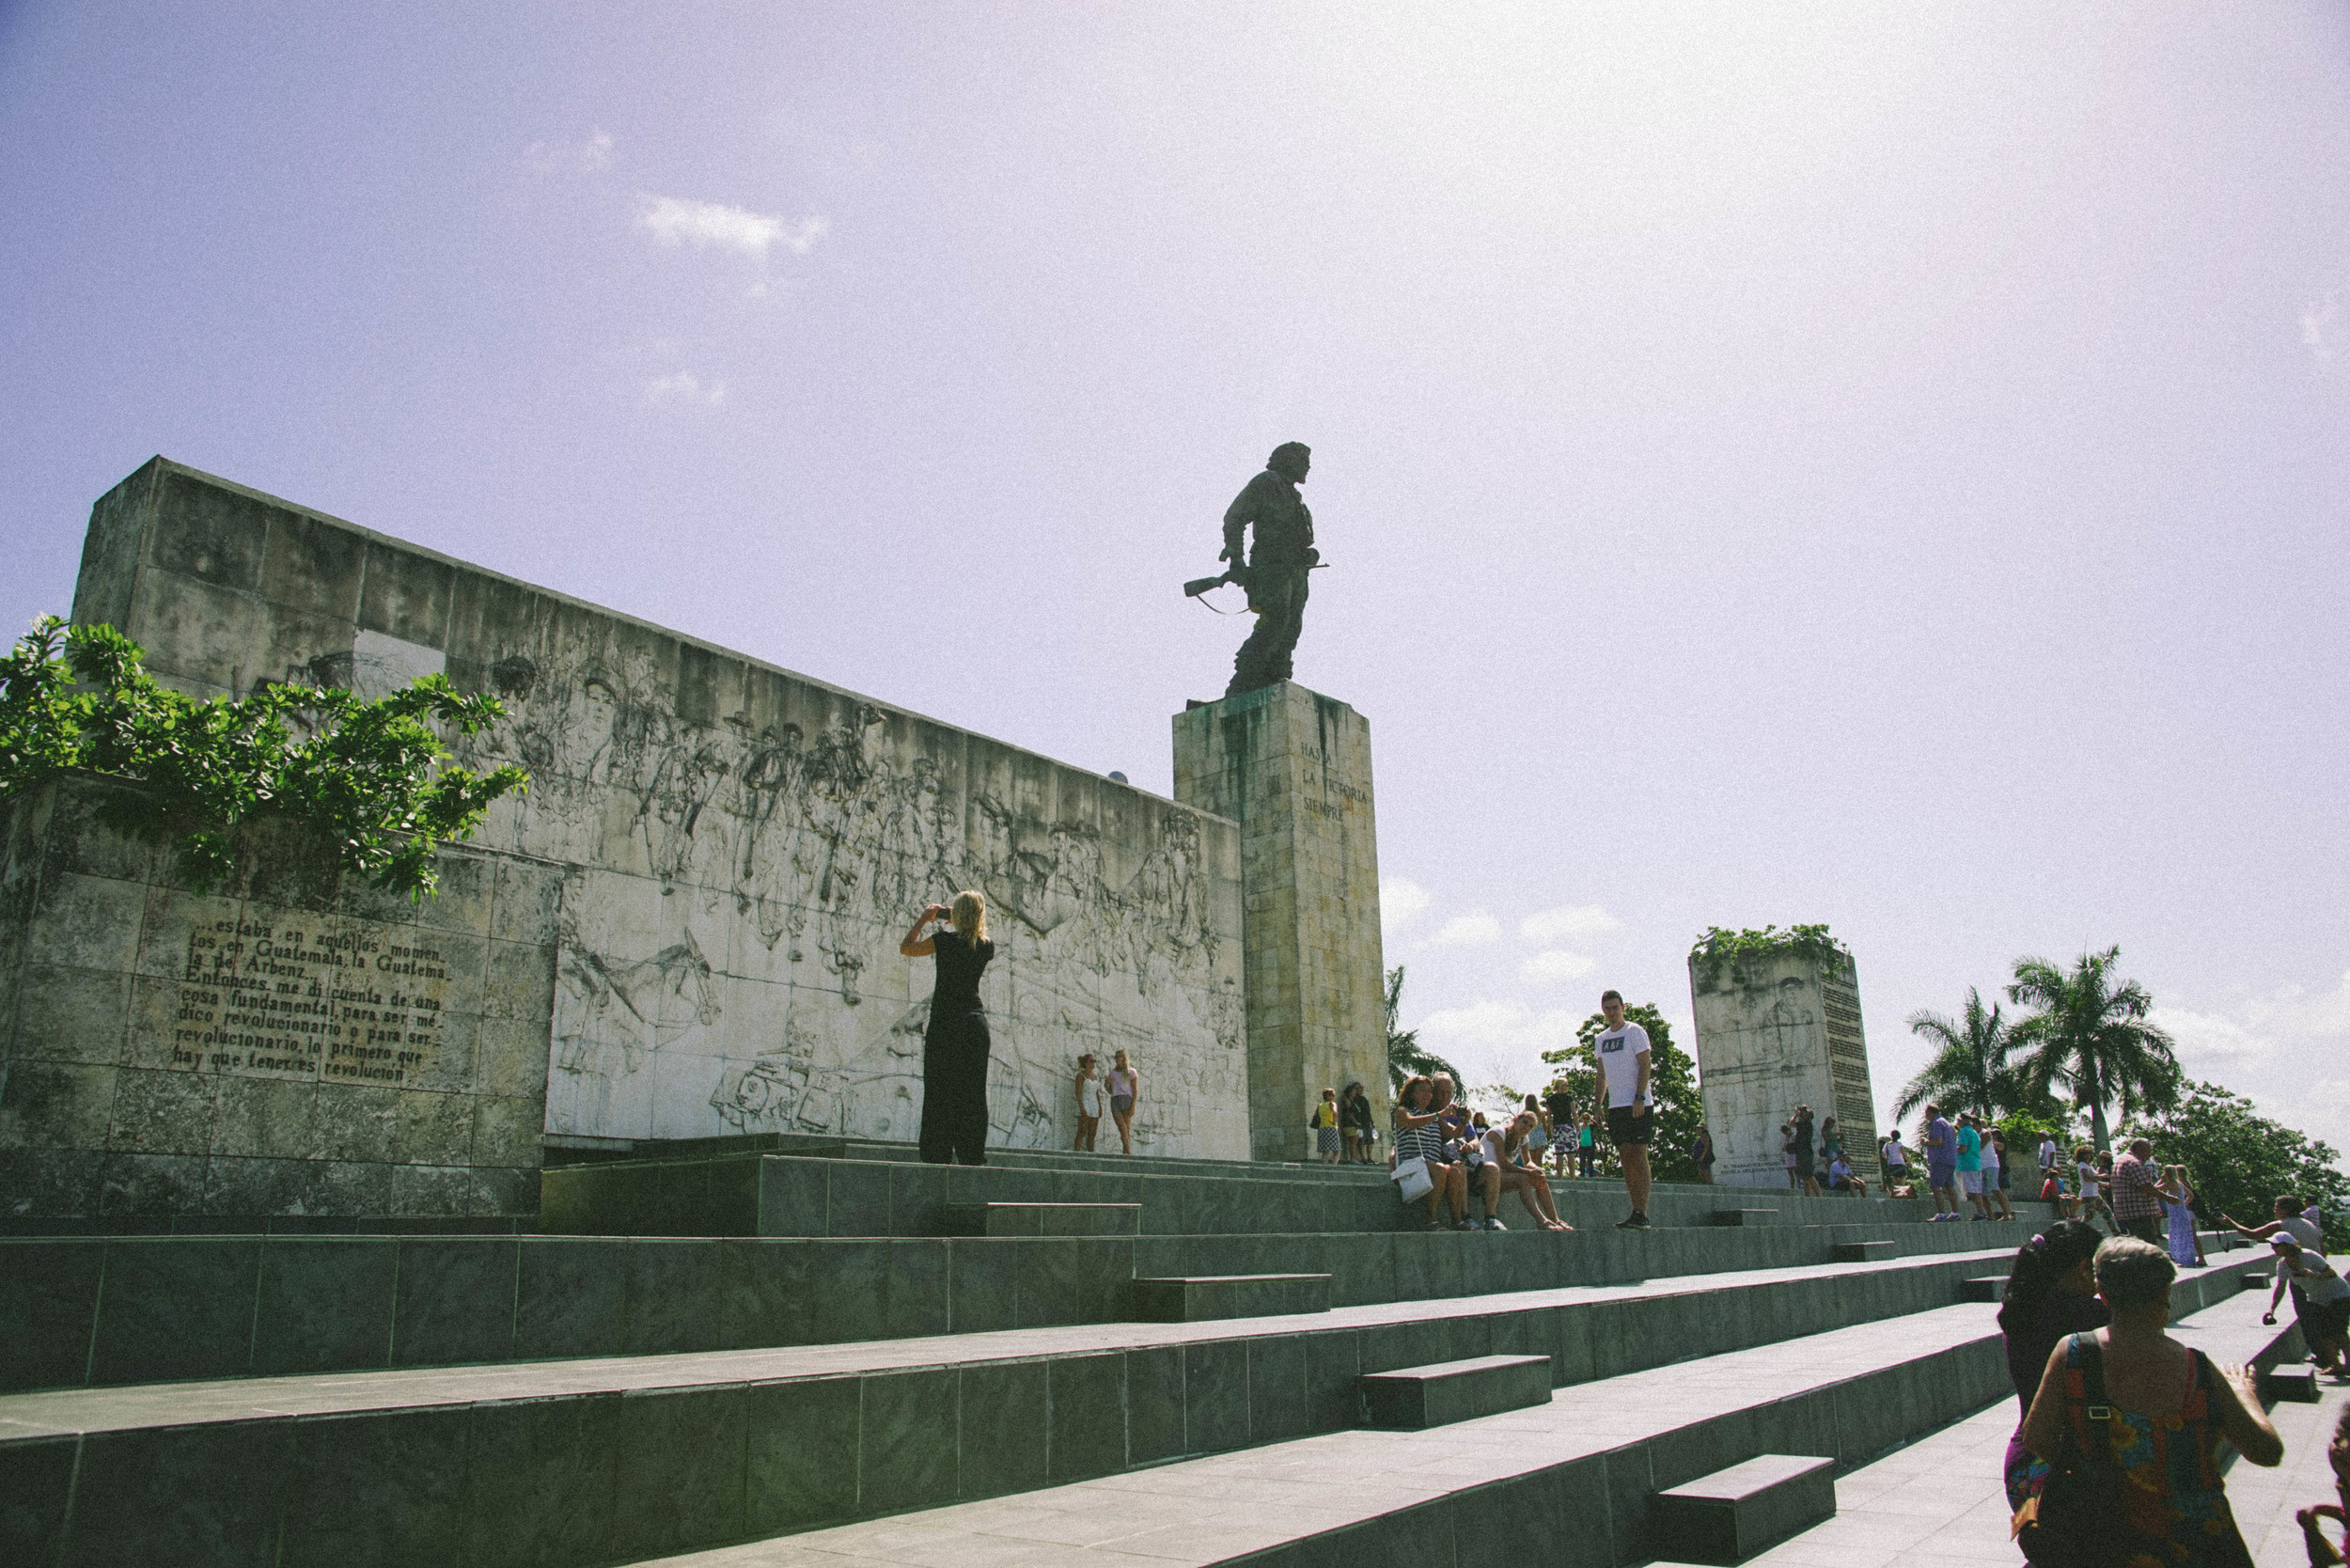 The Che Guevara Mausoleum.